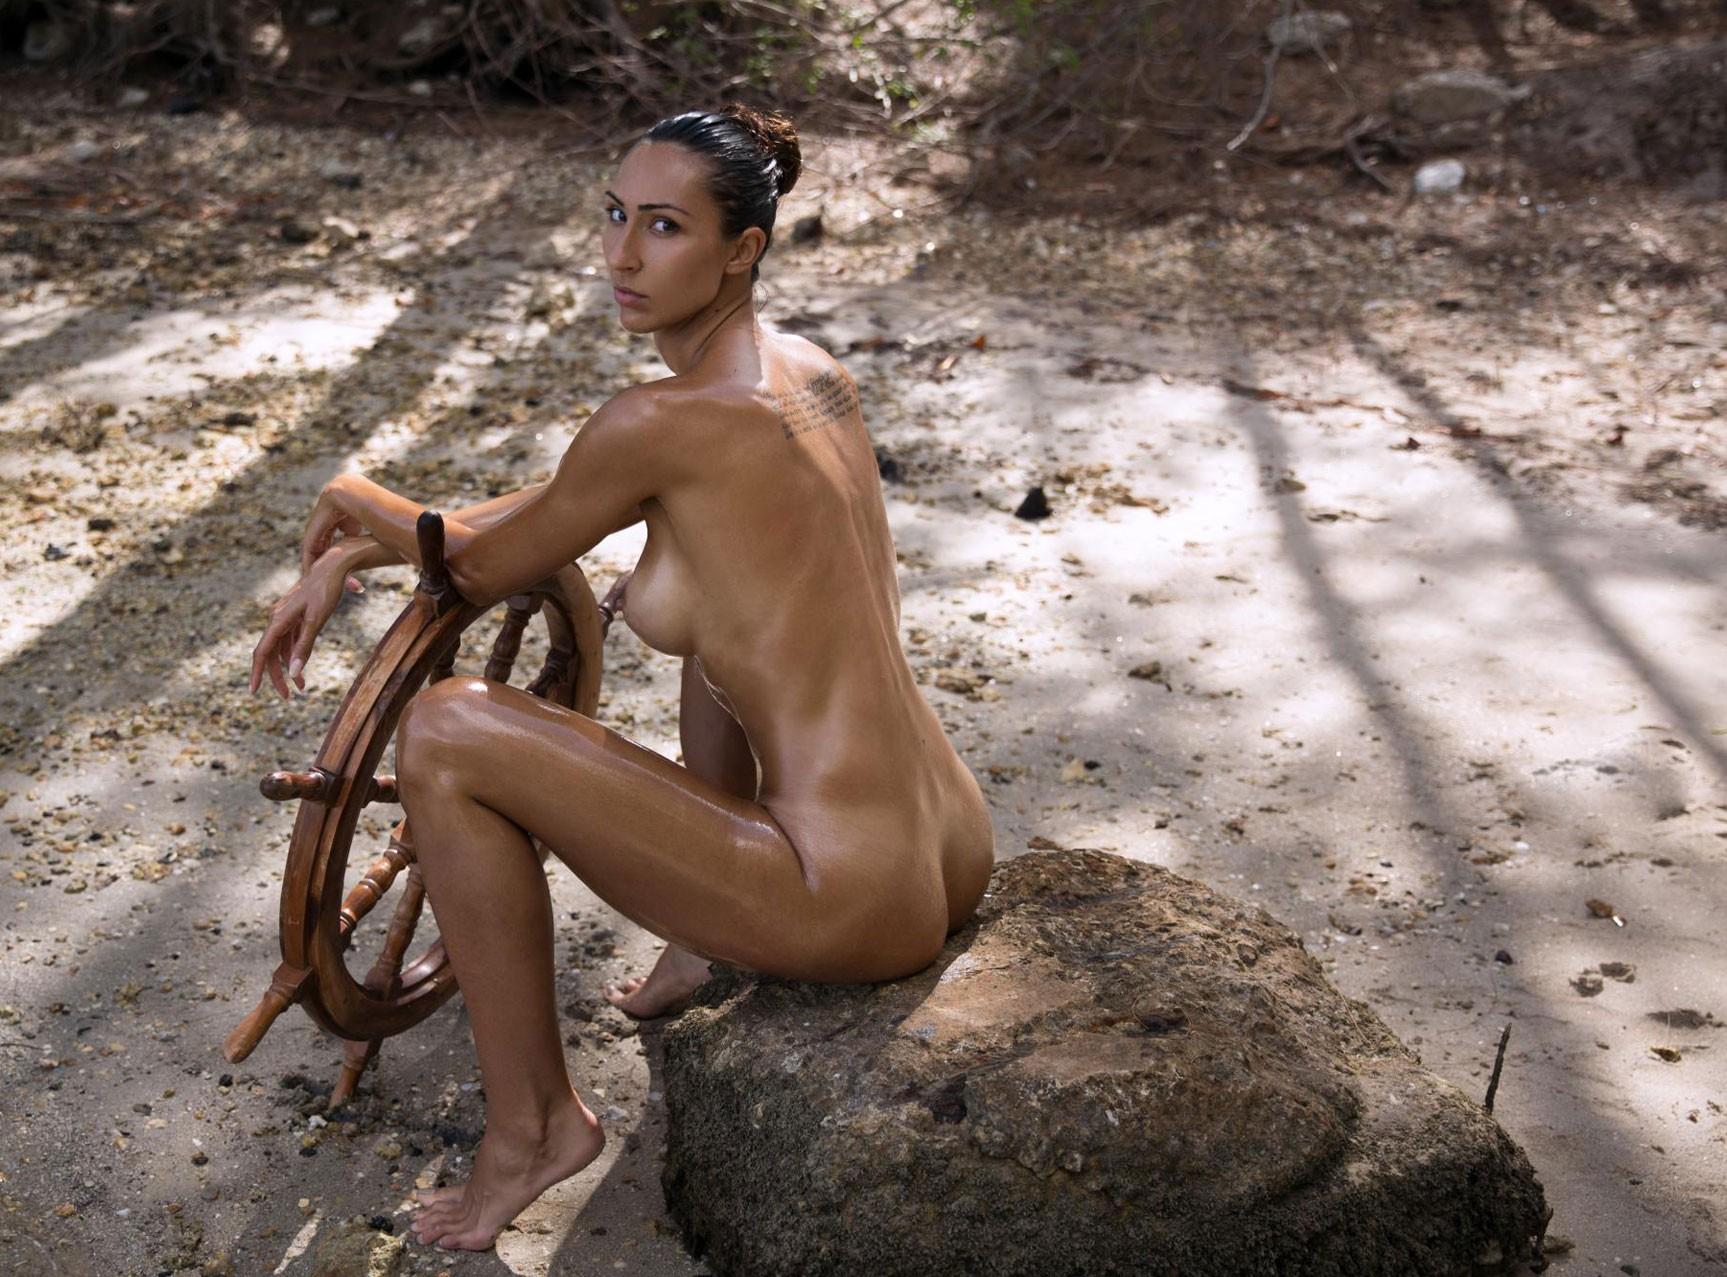 Isidora-Madzarevic-Ocean-Unicorn-by-James-Felix-4.jpg